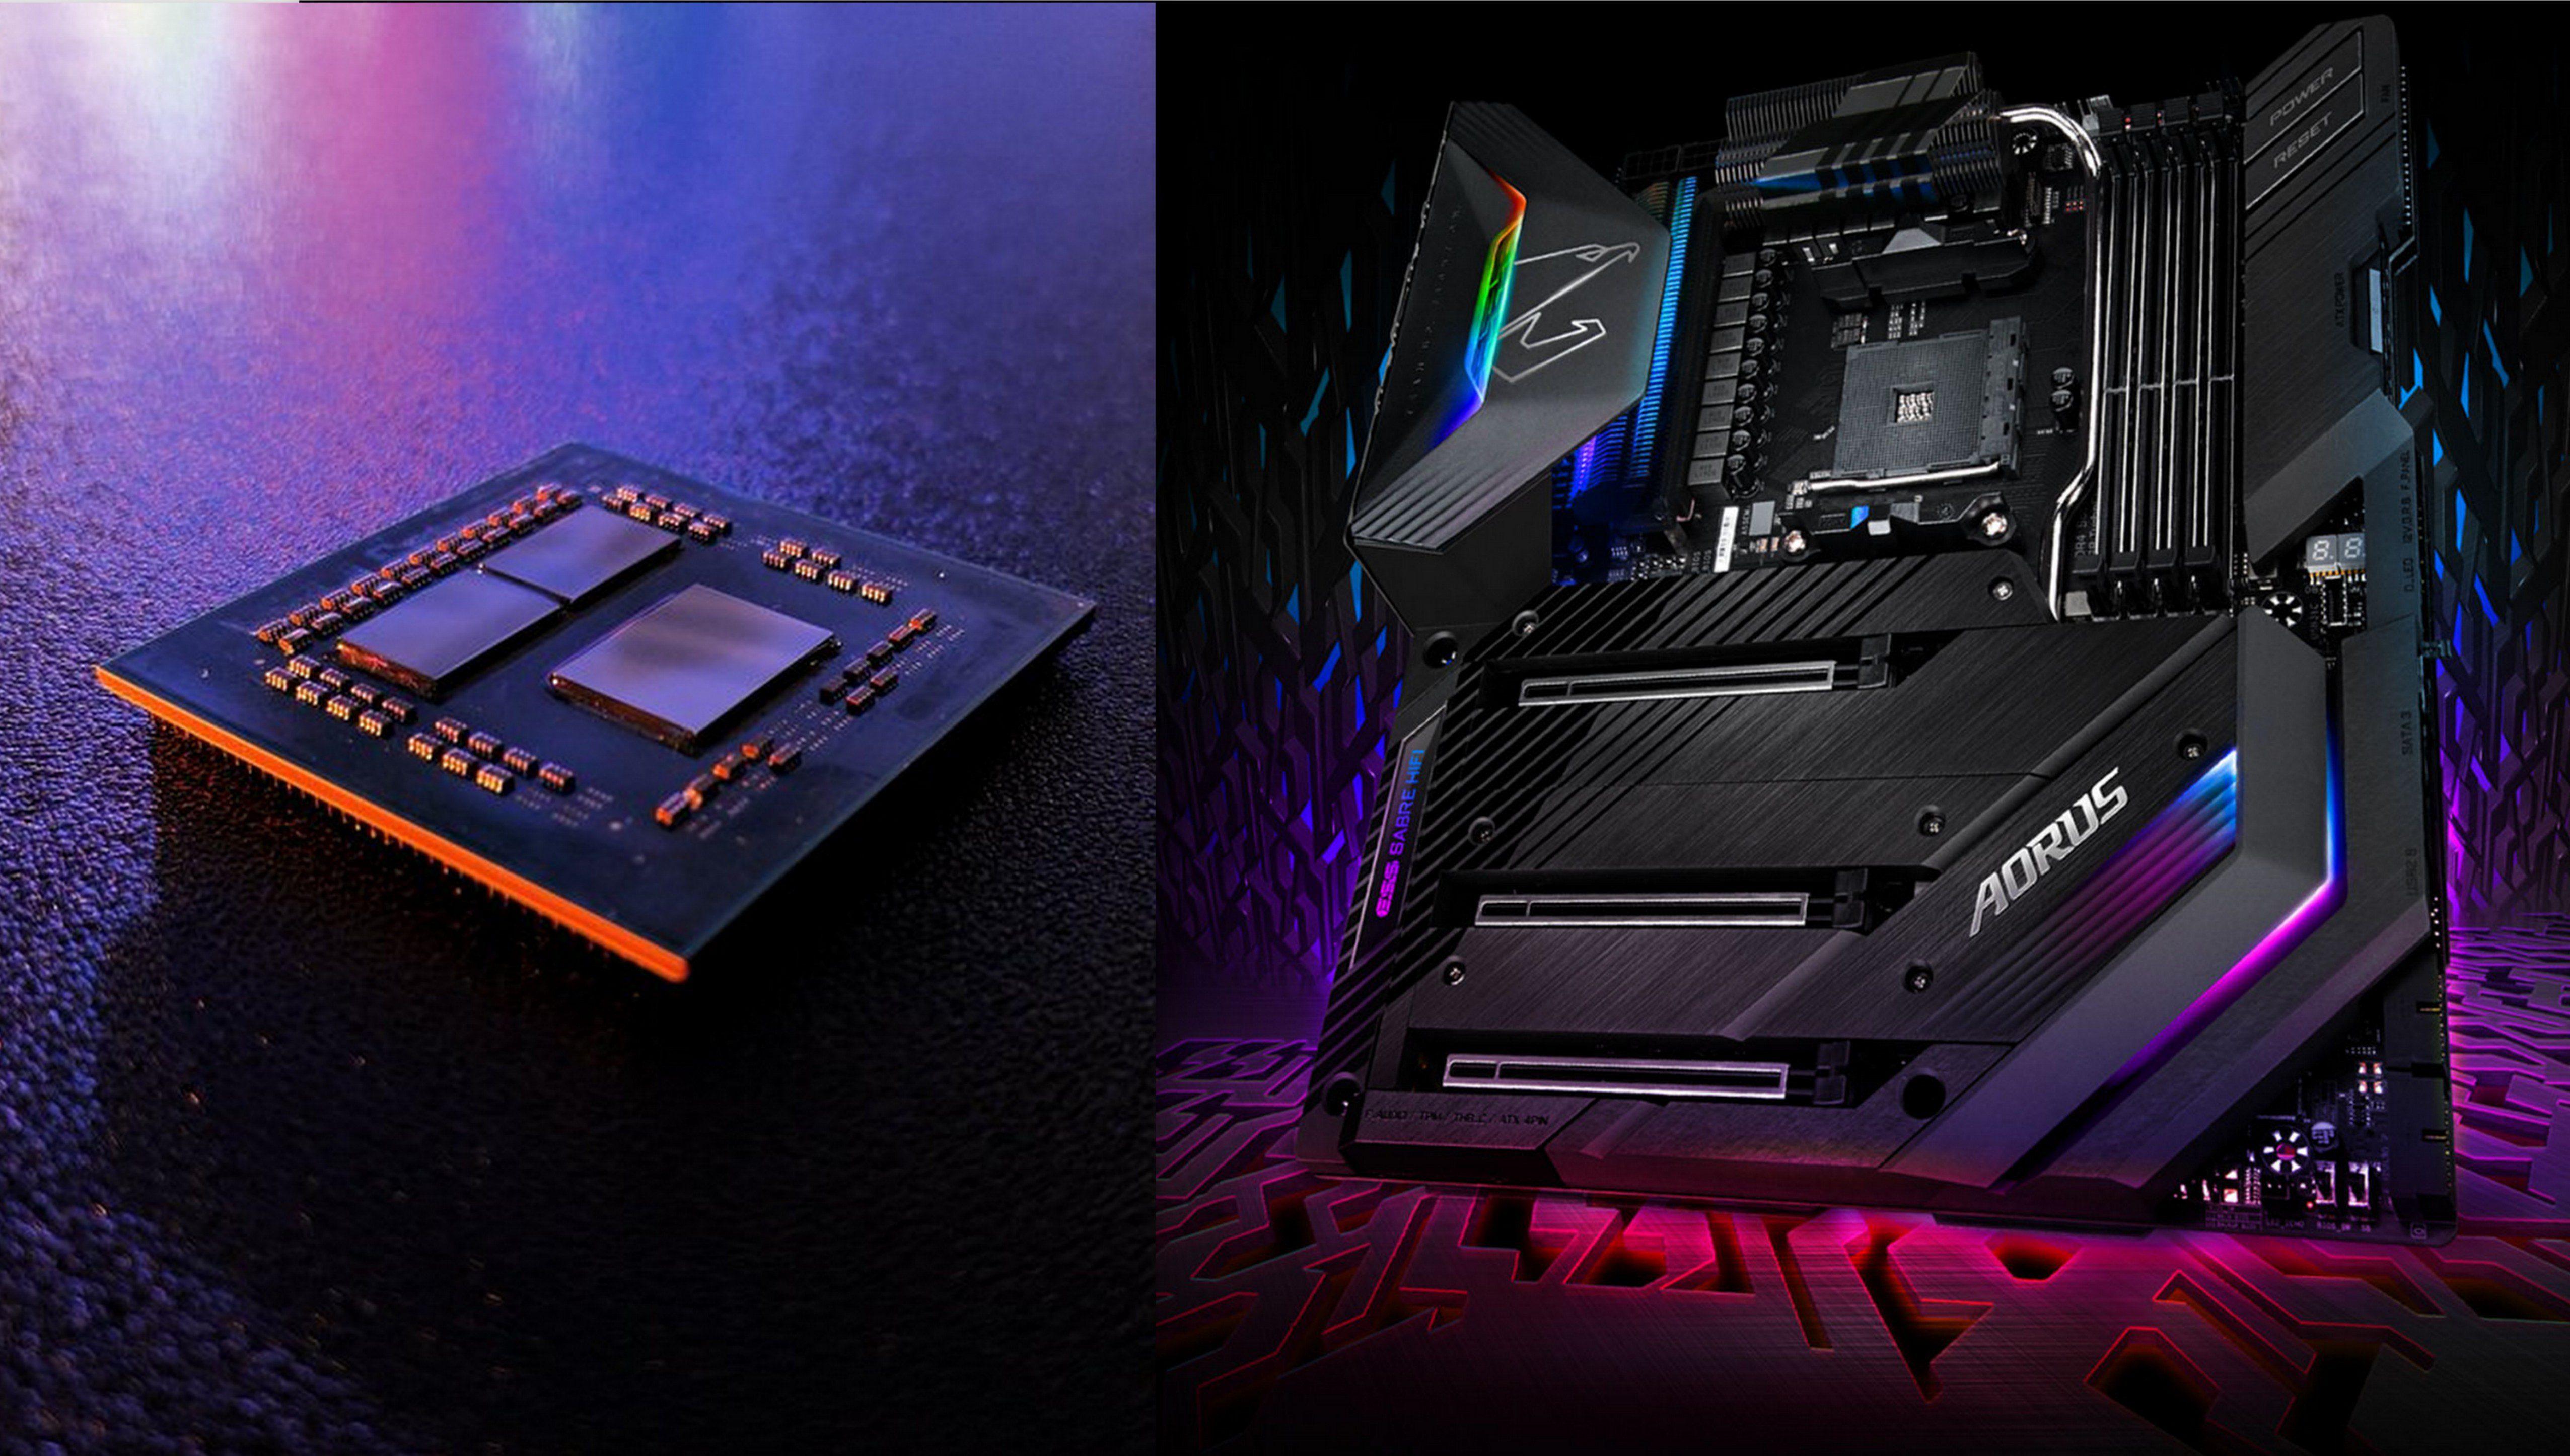 Ryzen 3000 CPUs & X570 motherboard prices leaked - TechnoSports